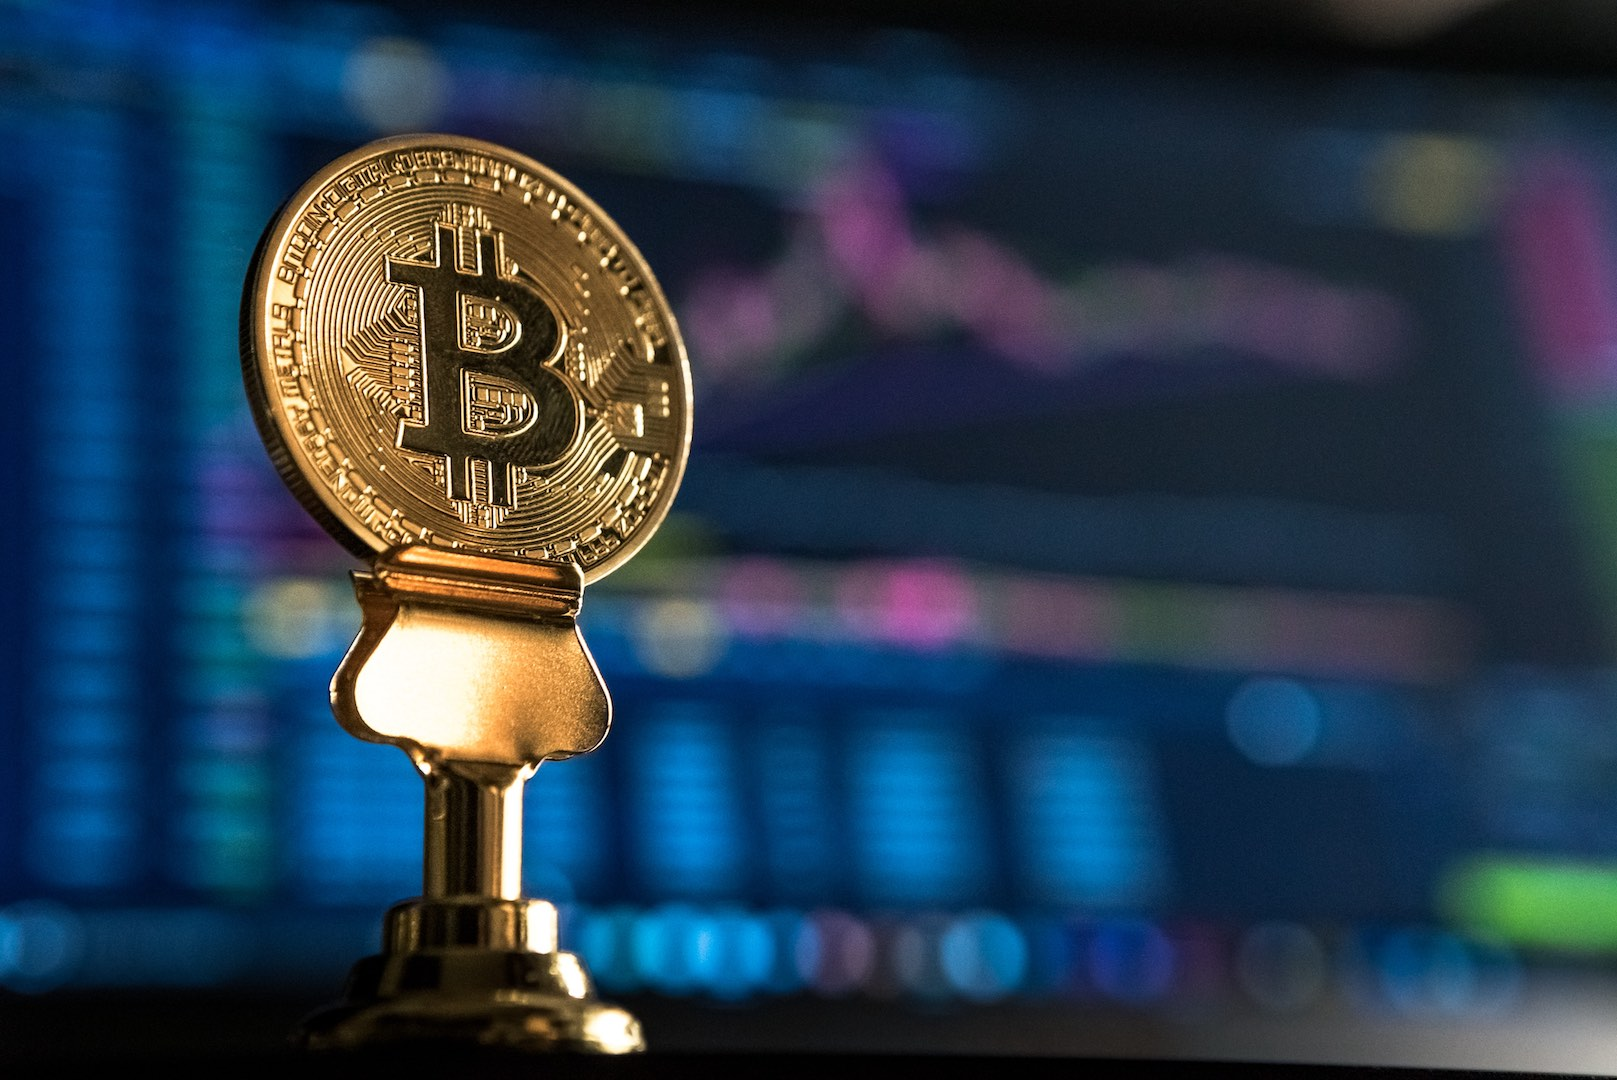 spekulacje nacfd forex bitcoin